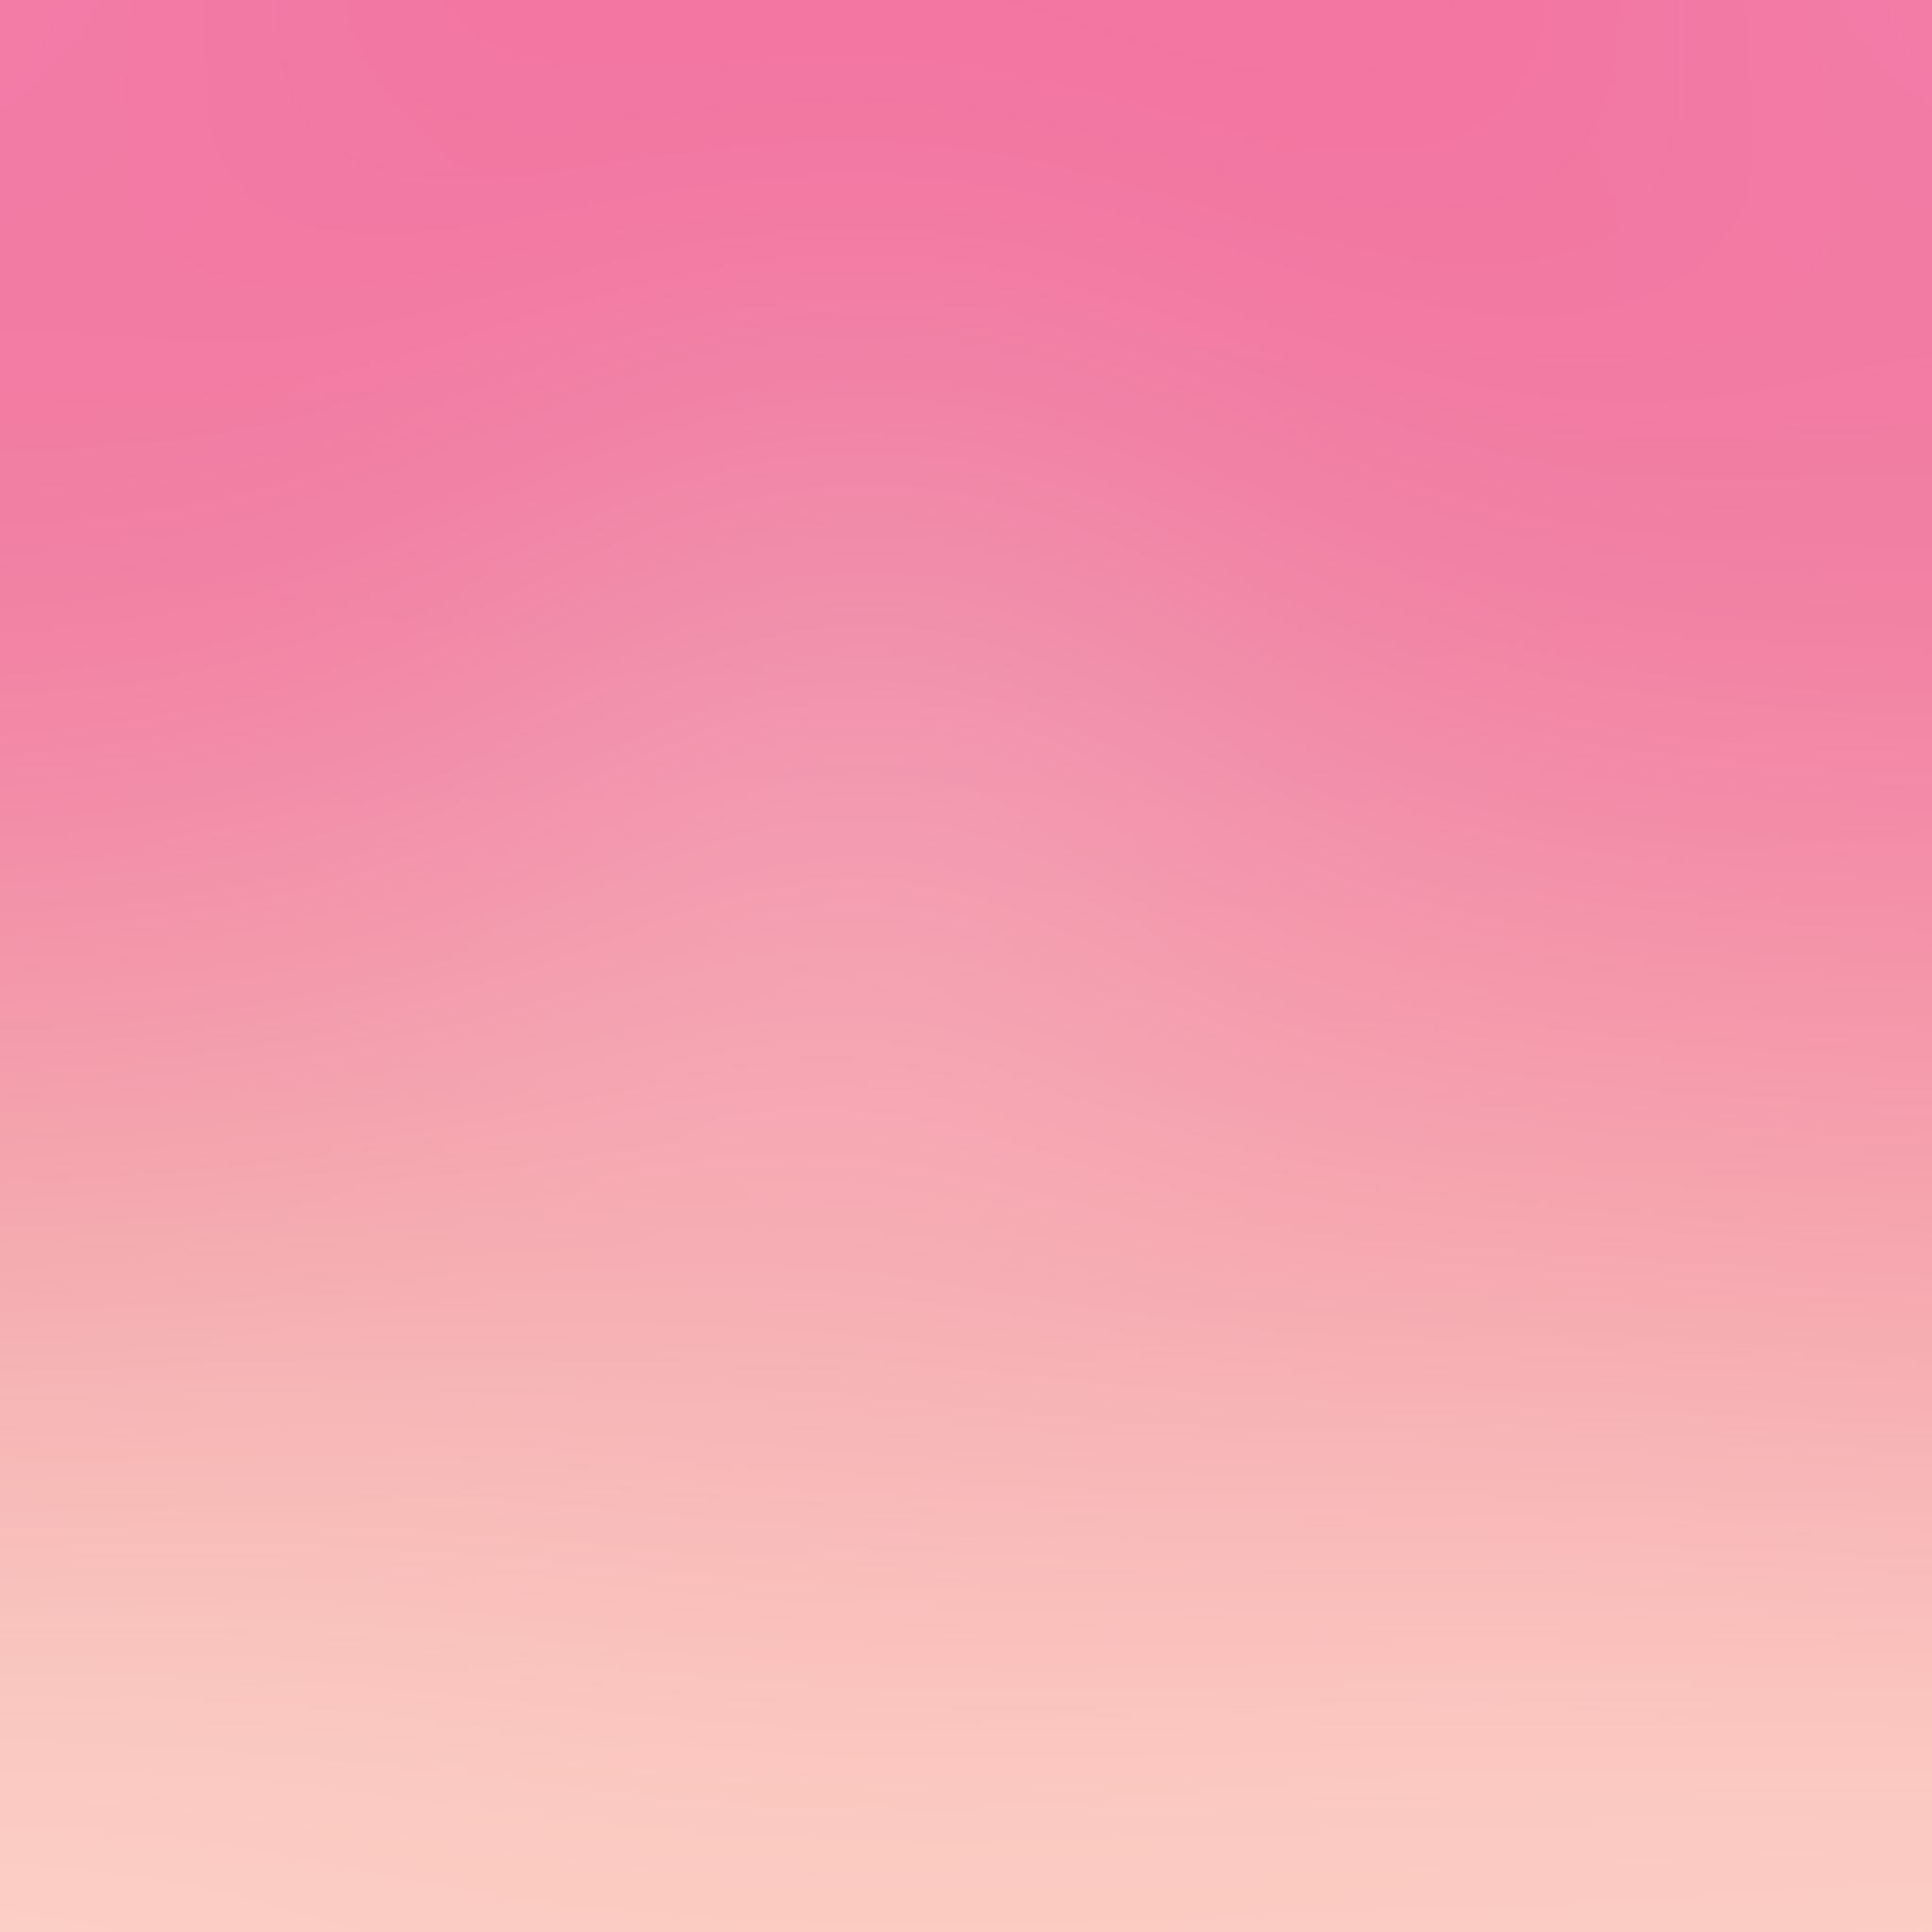 Iphone Wallpaper Pink: Pink Yellow Gradation Blur IPad Air Wallpaper Download